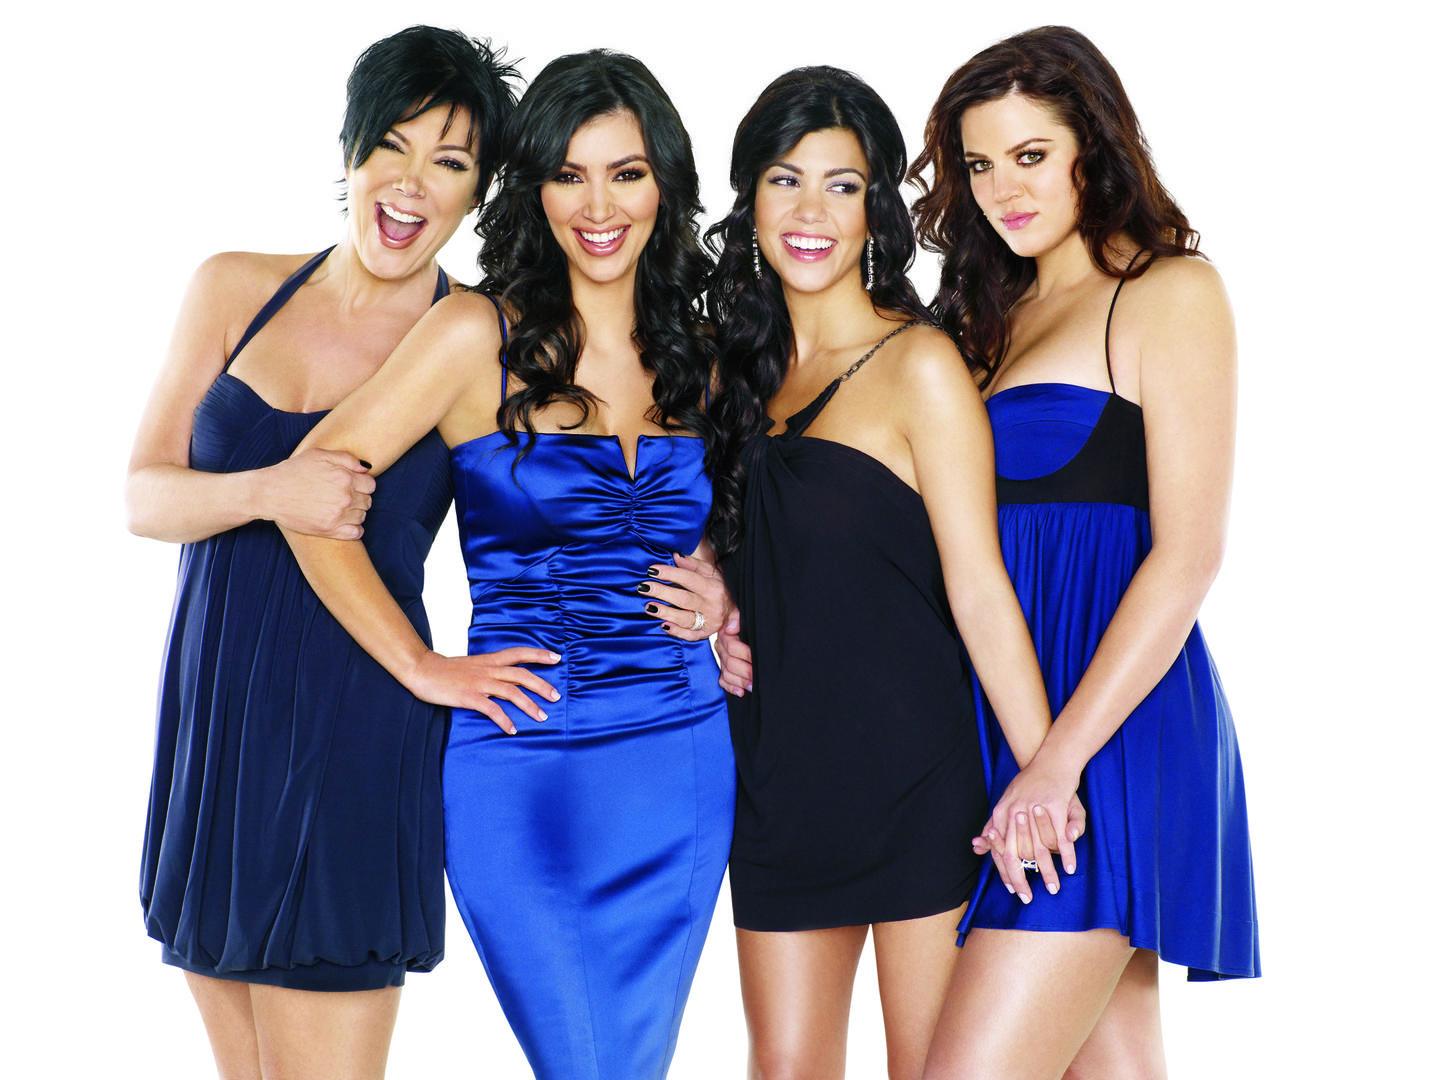 keeping-up-with-the-kardashians-temporada-2